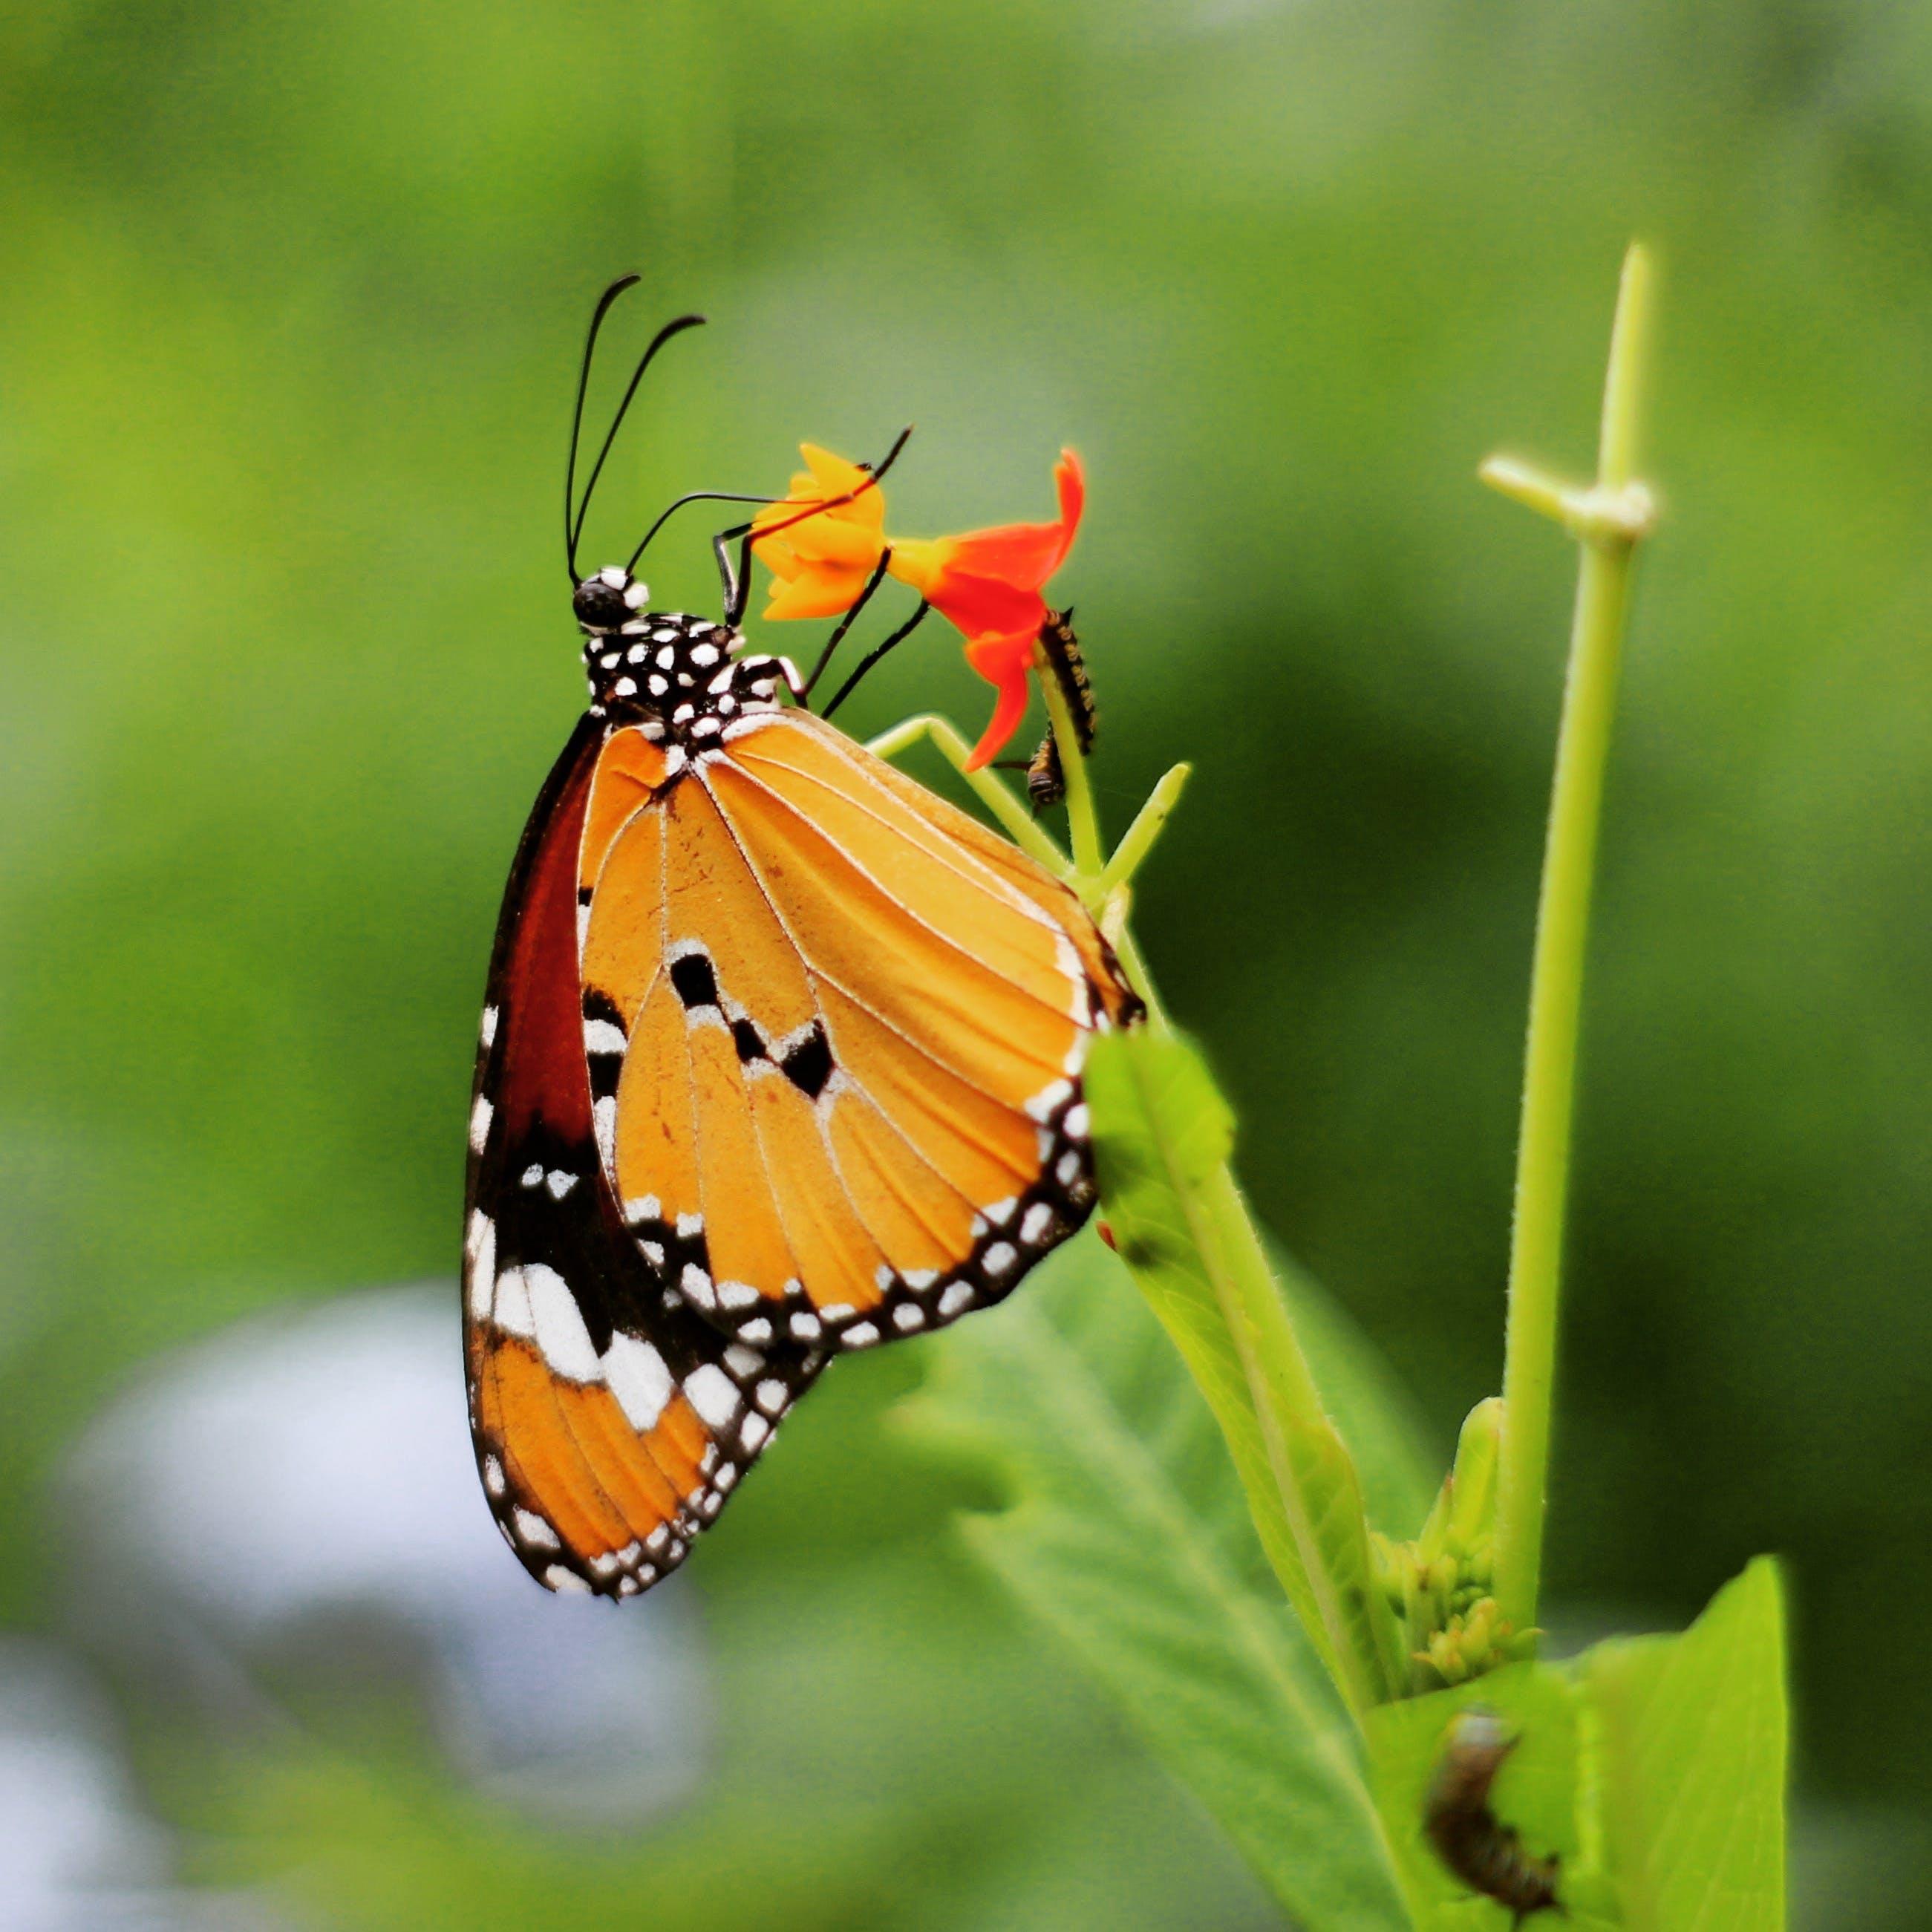 Free stock photo of #butterfly #sumner #wildlife #wildlifephotography